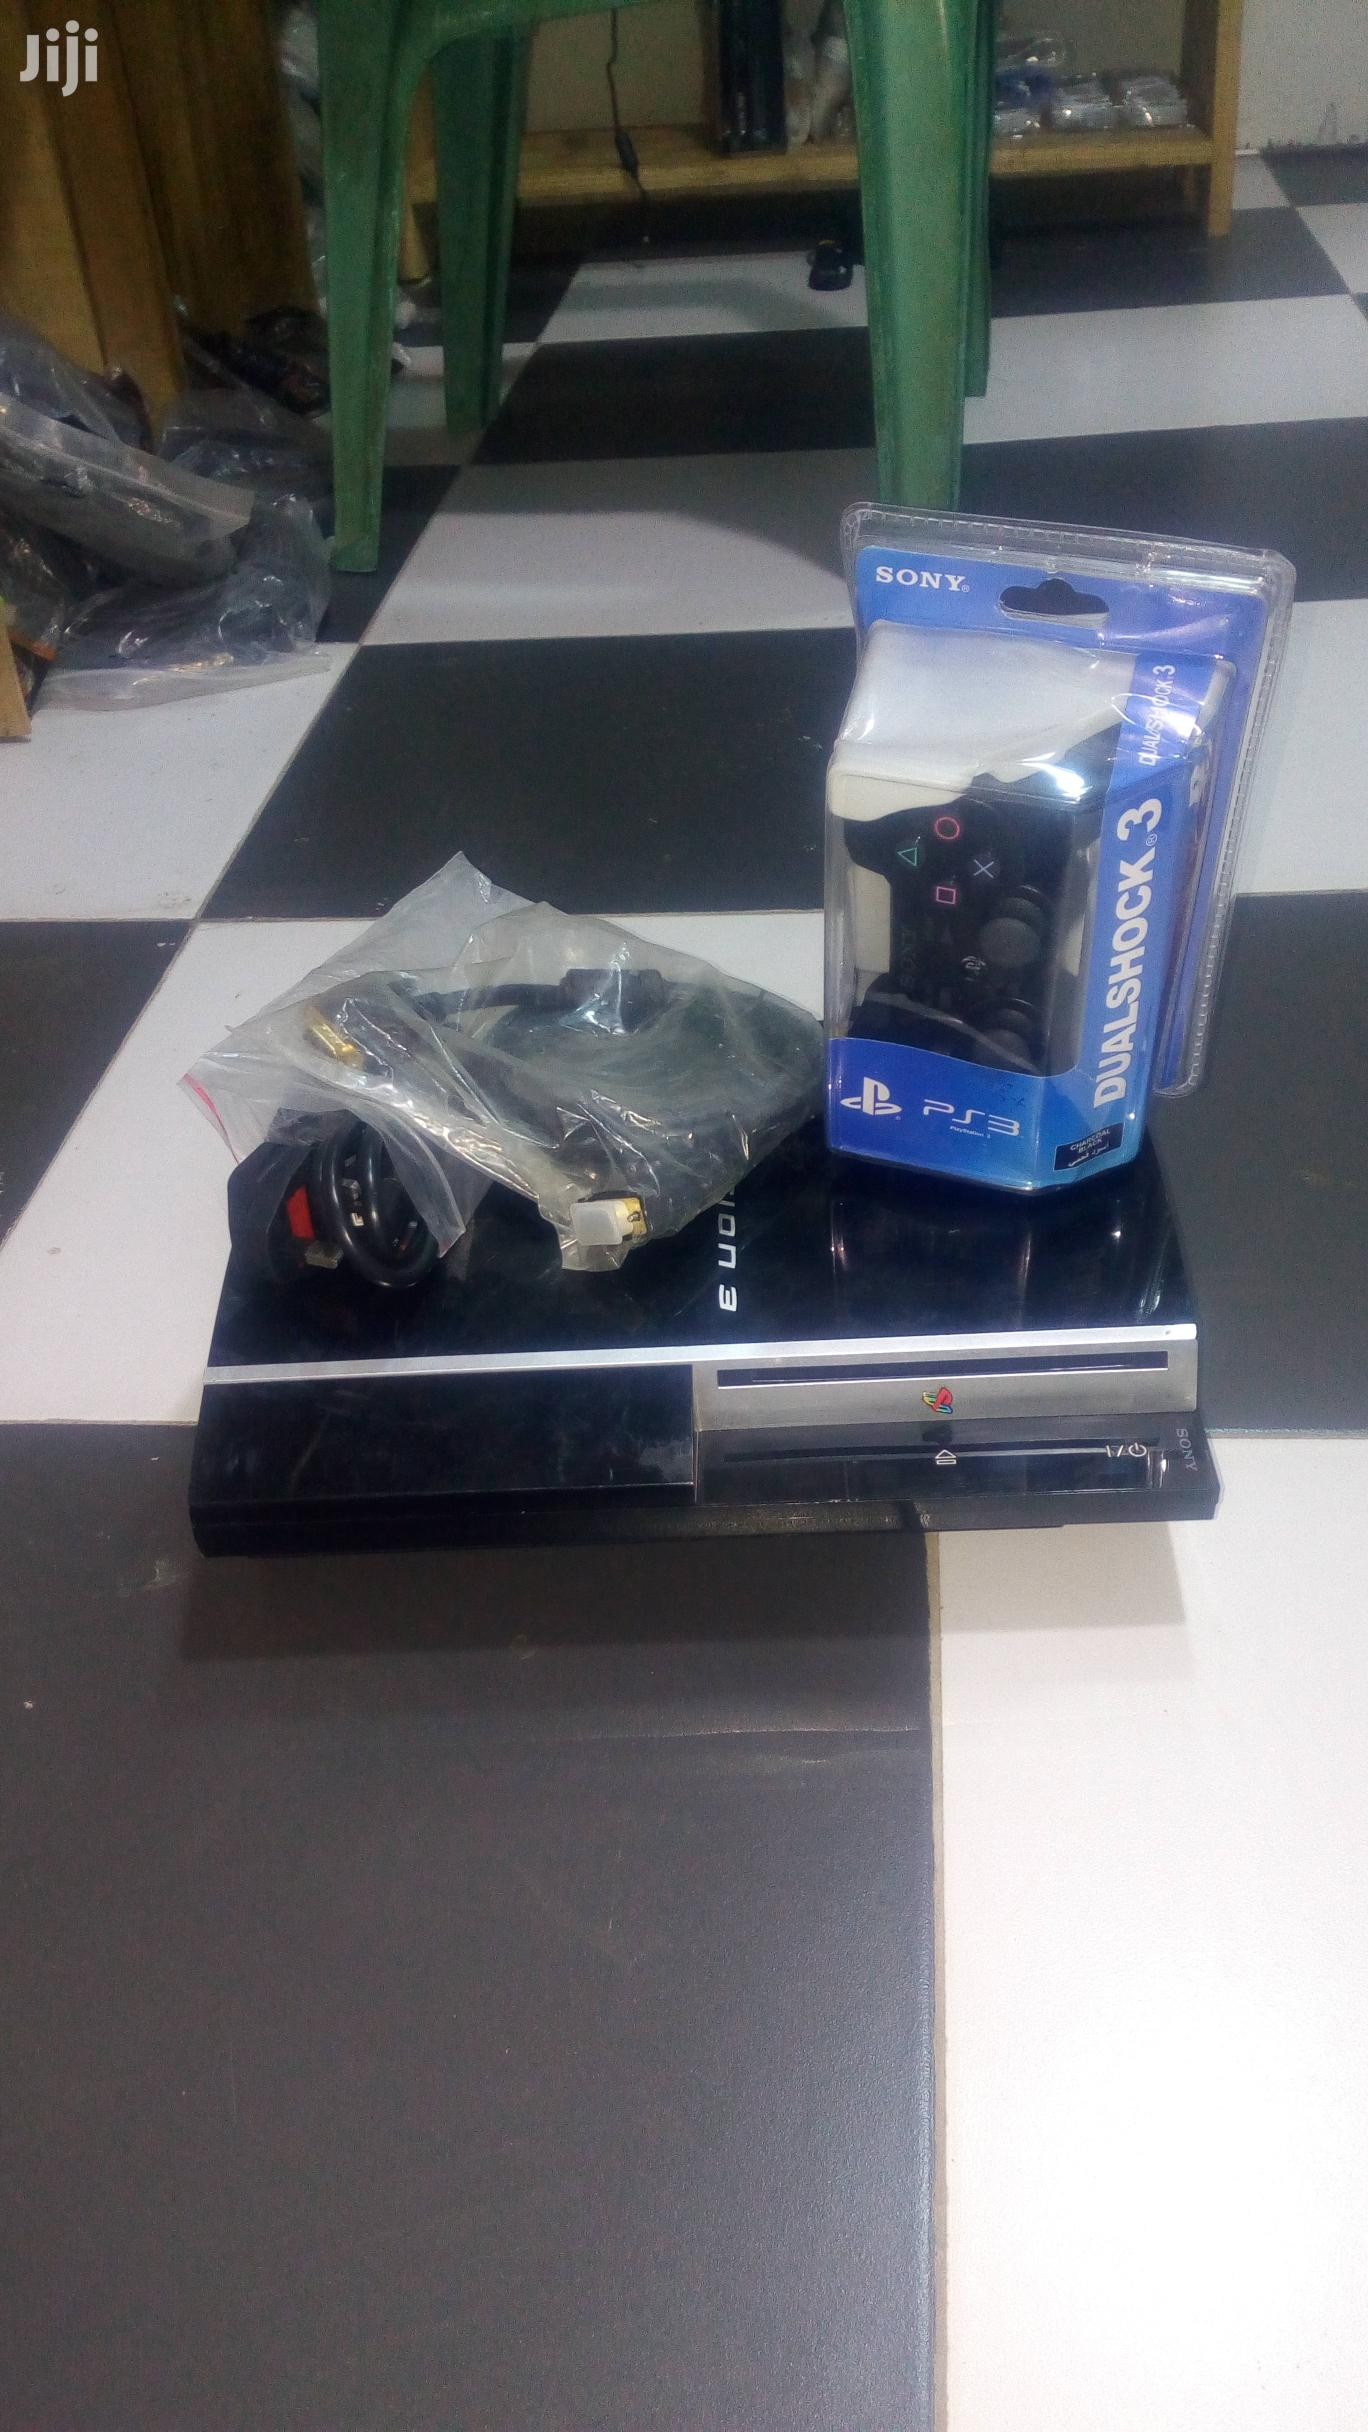 PS3 Complete Set